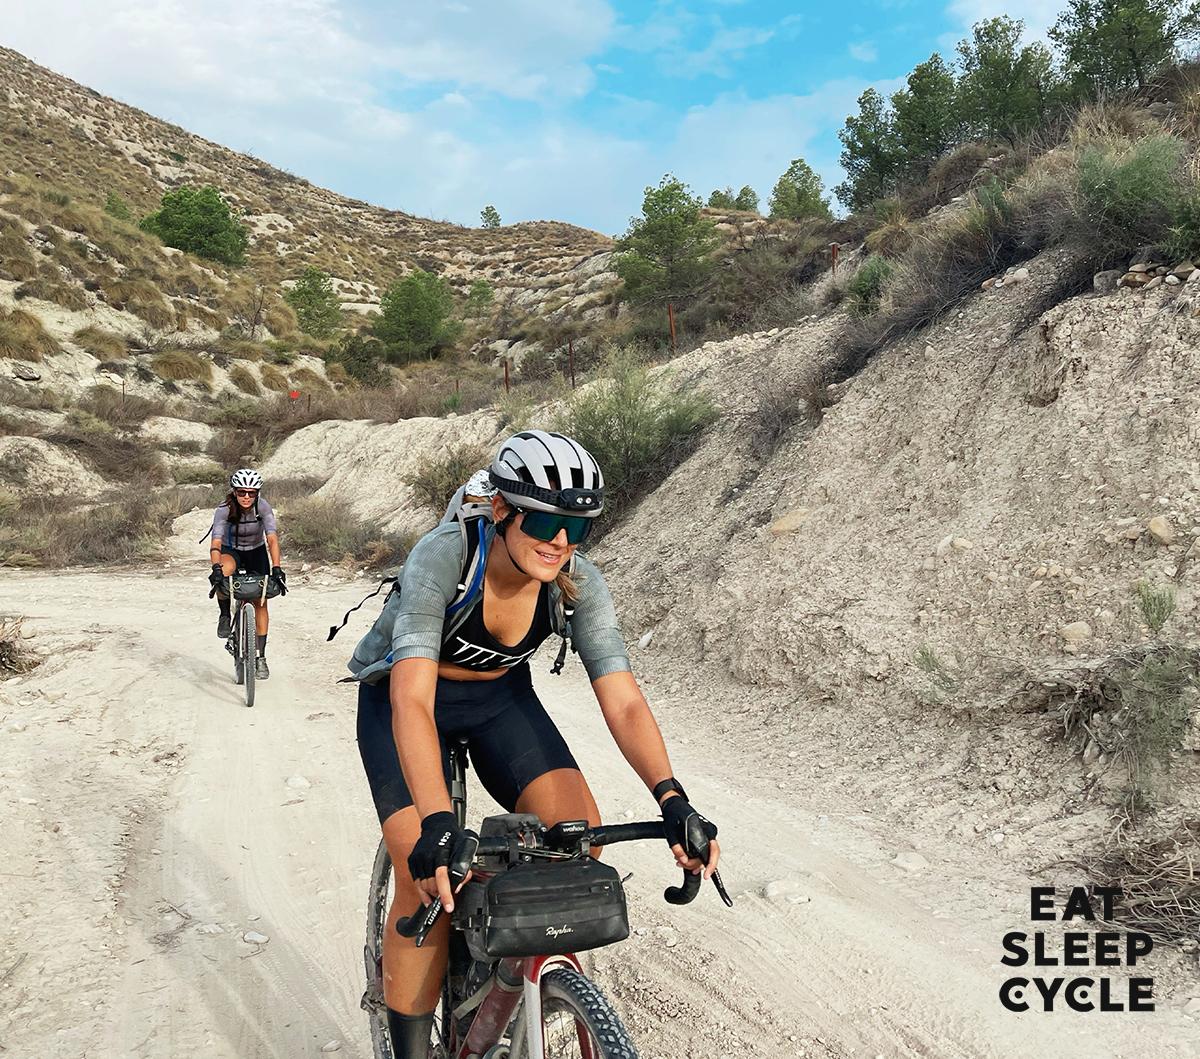 Eat-Sleep-Cycle-Badlands-Gravel-Cycling-Gorafe-Desert